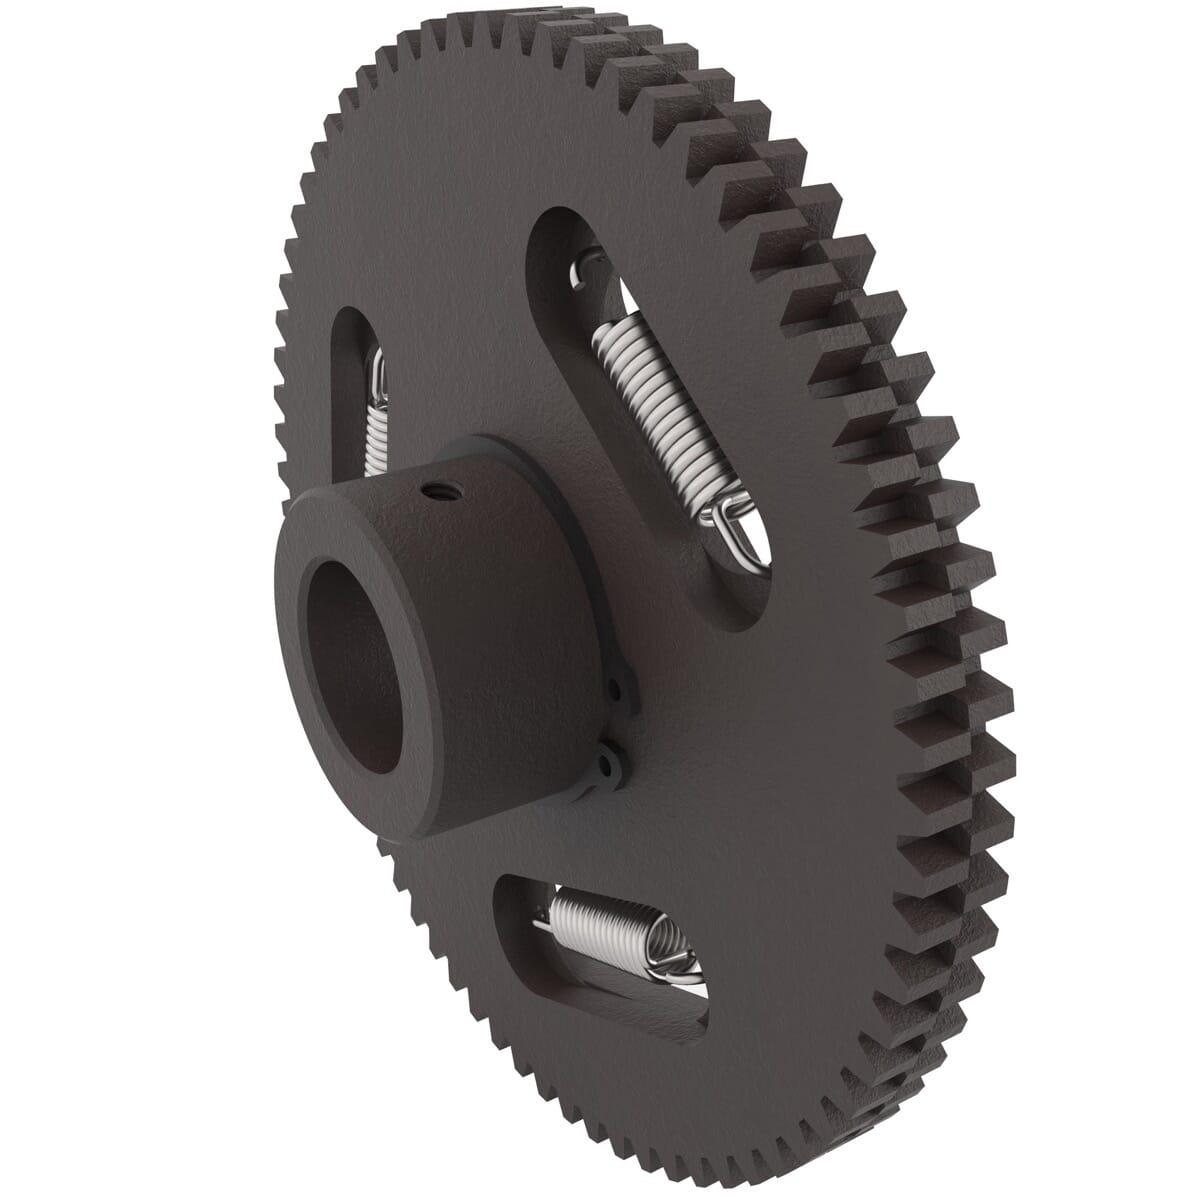 ha Mfg Code 1-030 AM0.7X6.7X6X250 Ametric/® Metric 0.7 Module 20 Deg 0.012 kg 0.0264 lbs Weight b Material: Acetal Resin 250 mm long L Pressure Angle 6 mm wide Injection Molded Metric Gear Rack 6.7 mm High